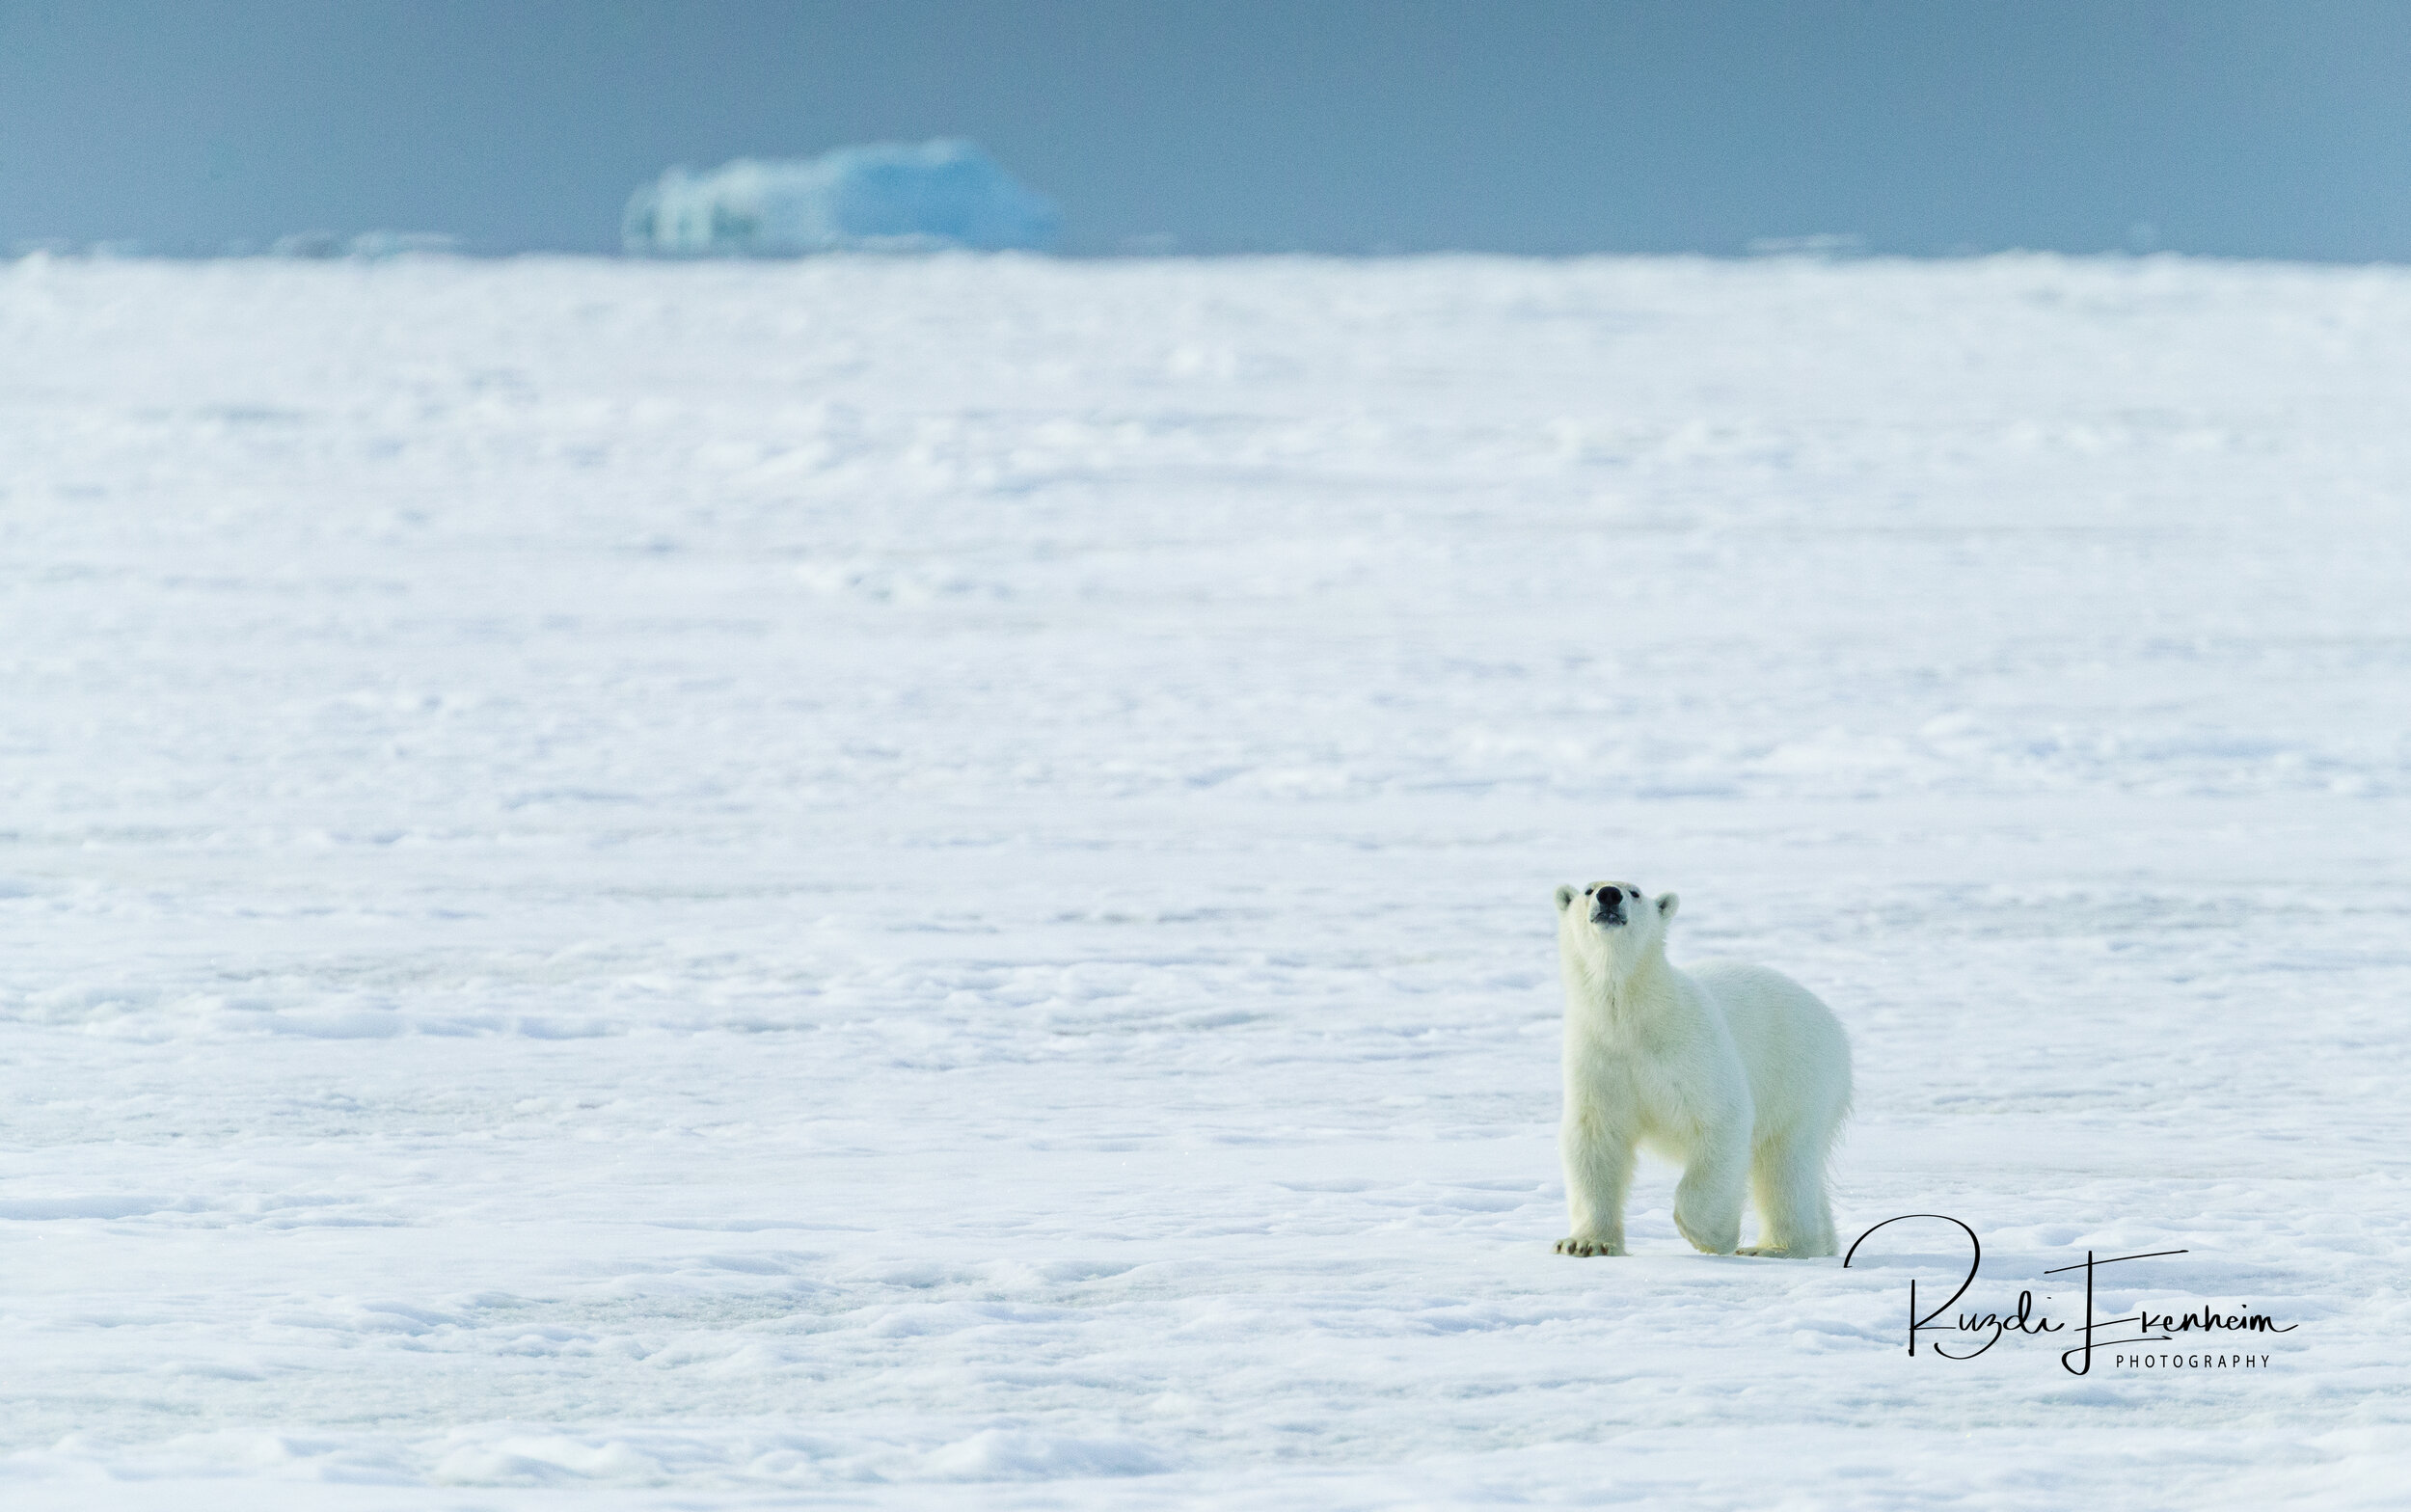 Somewhere in Svalbard this polar bear has noticed my sent